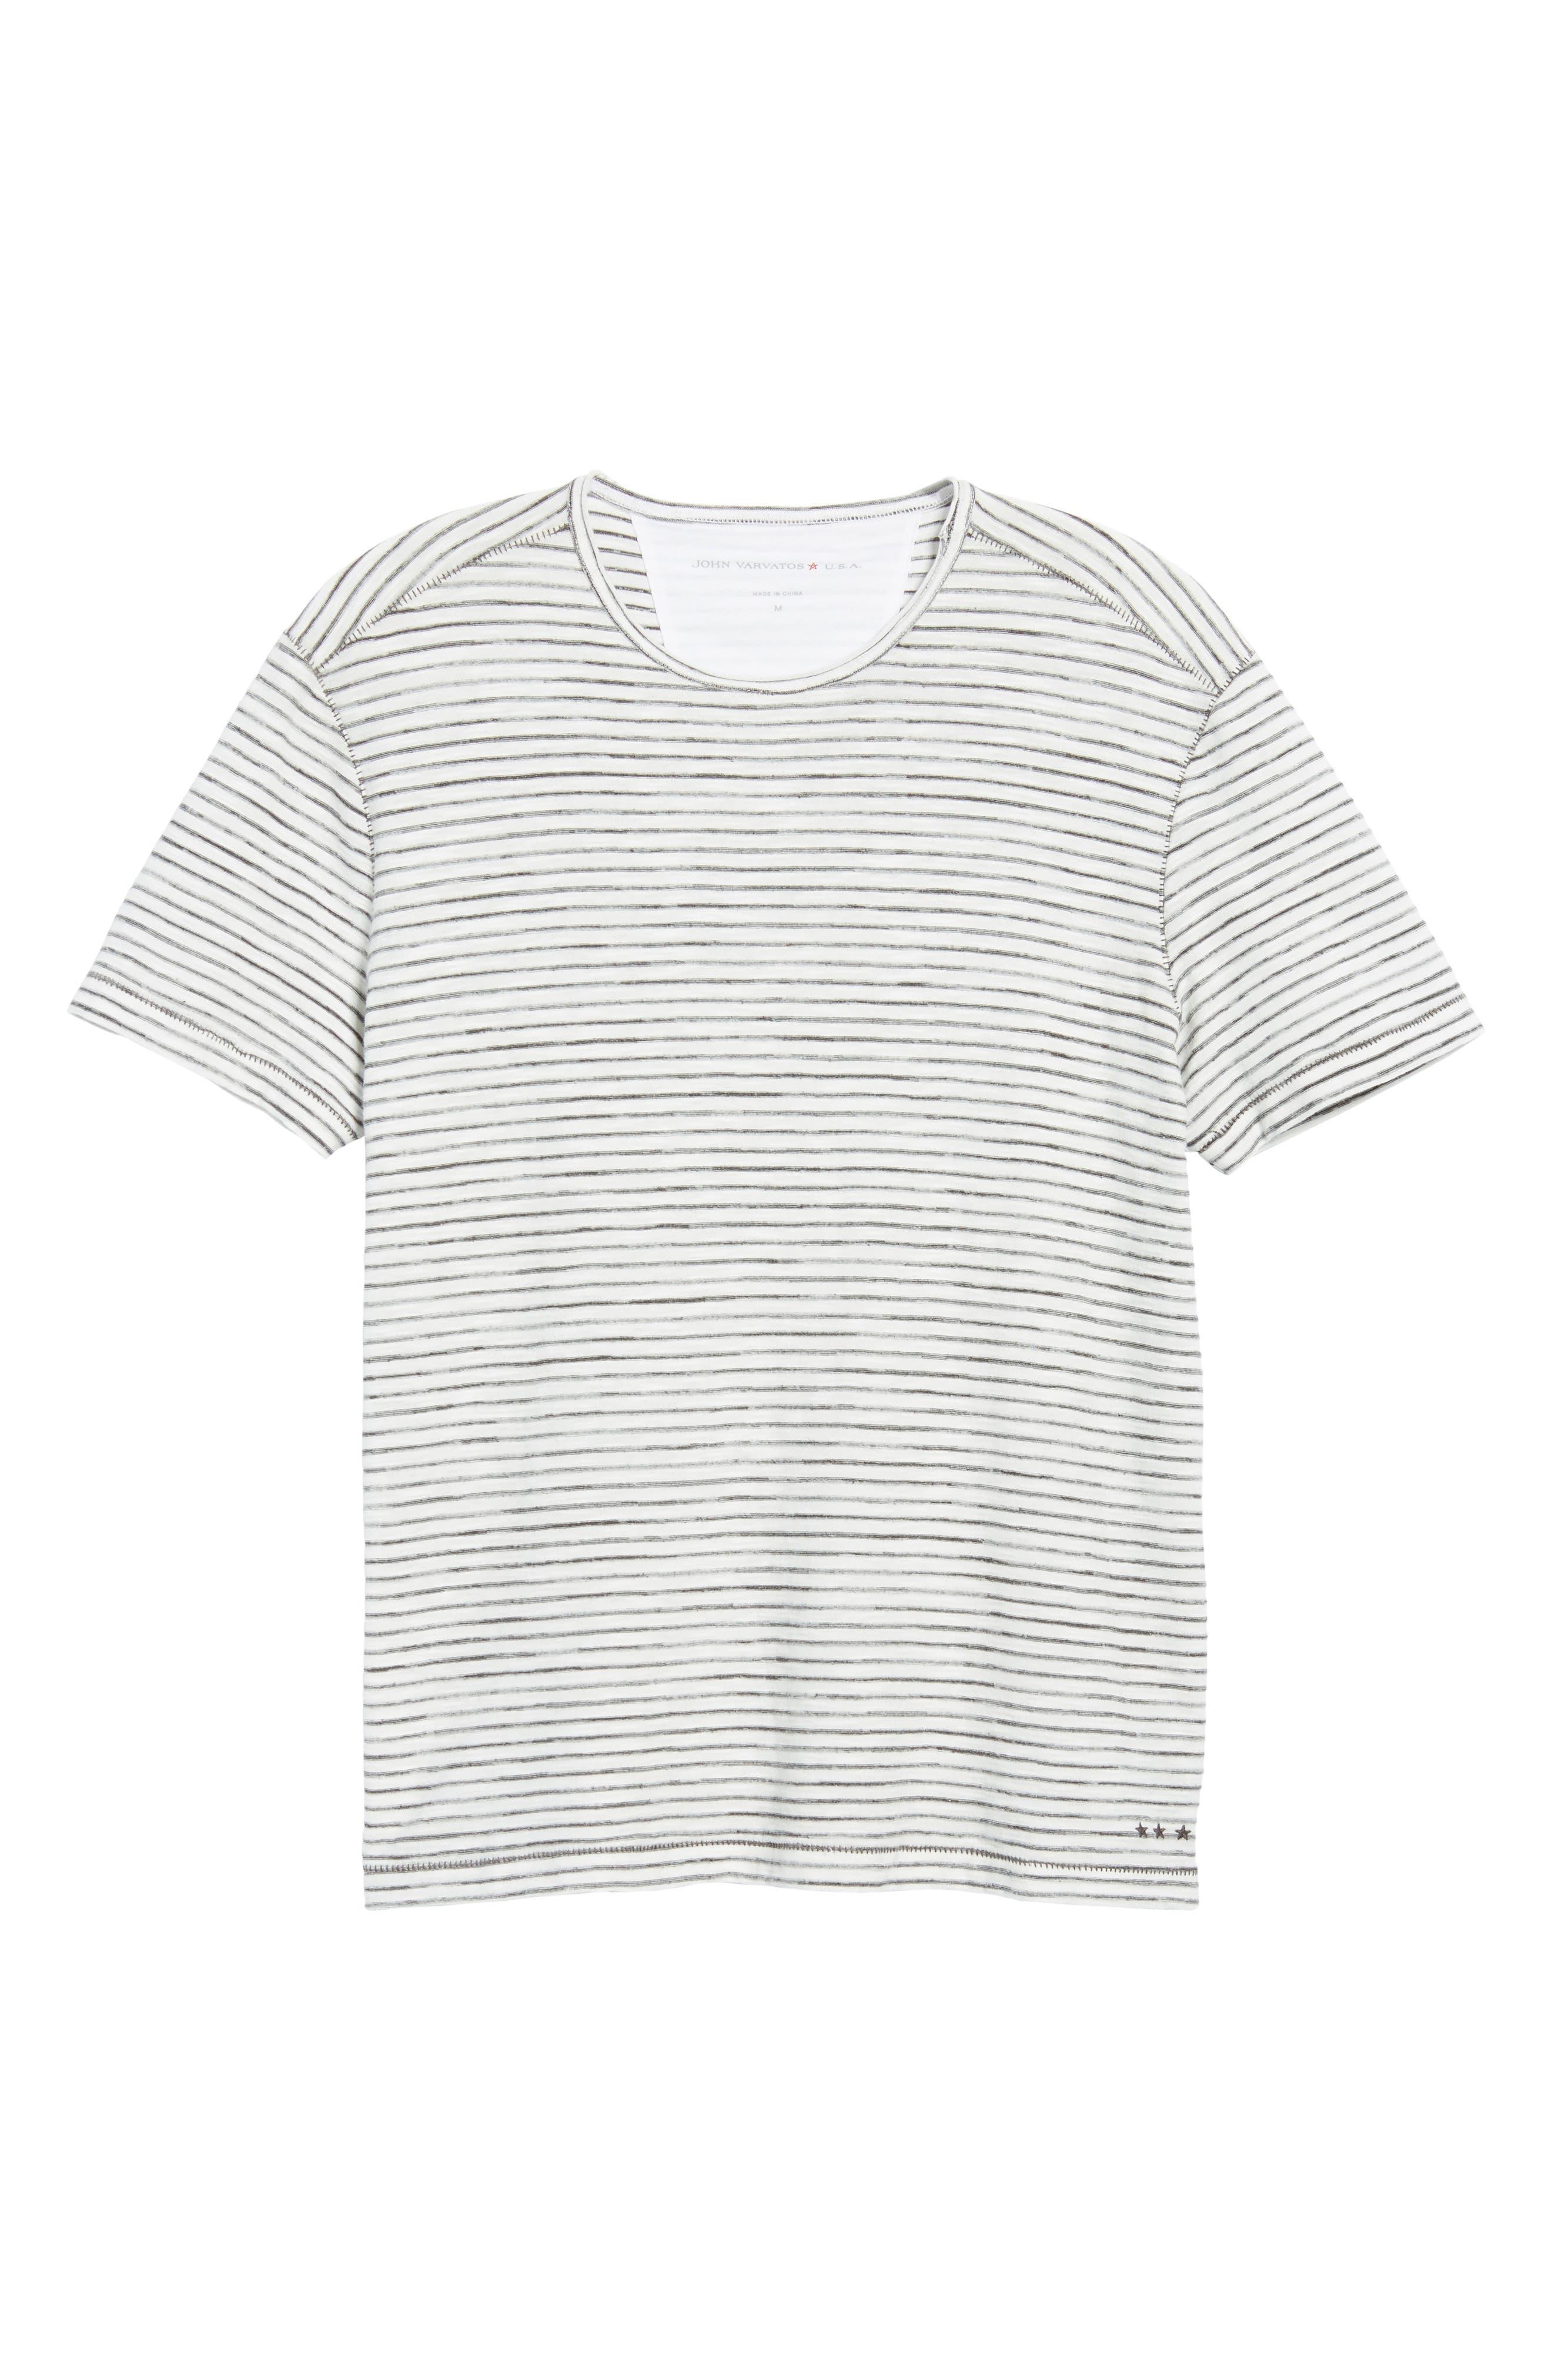 Slim Fit T-Shirt,                             Alternate thumbnail 6, color,                             White